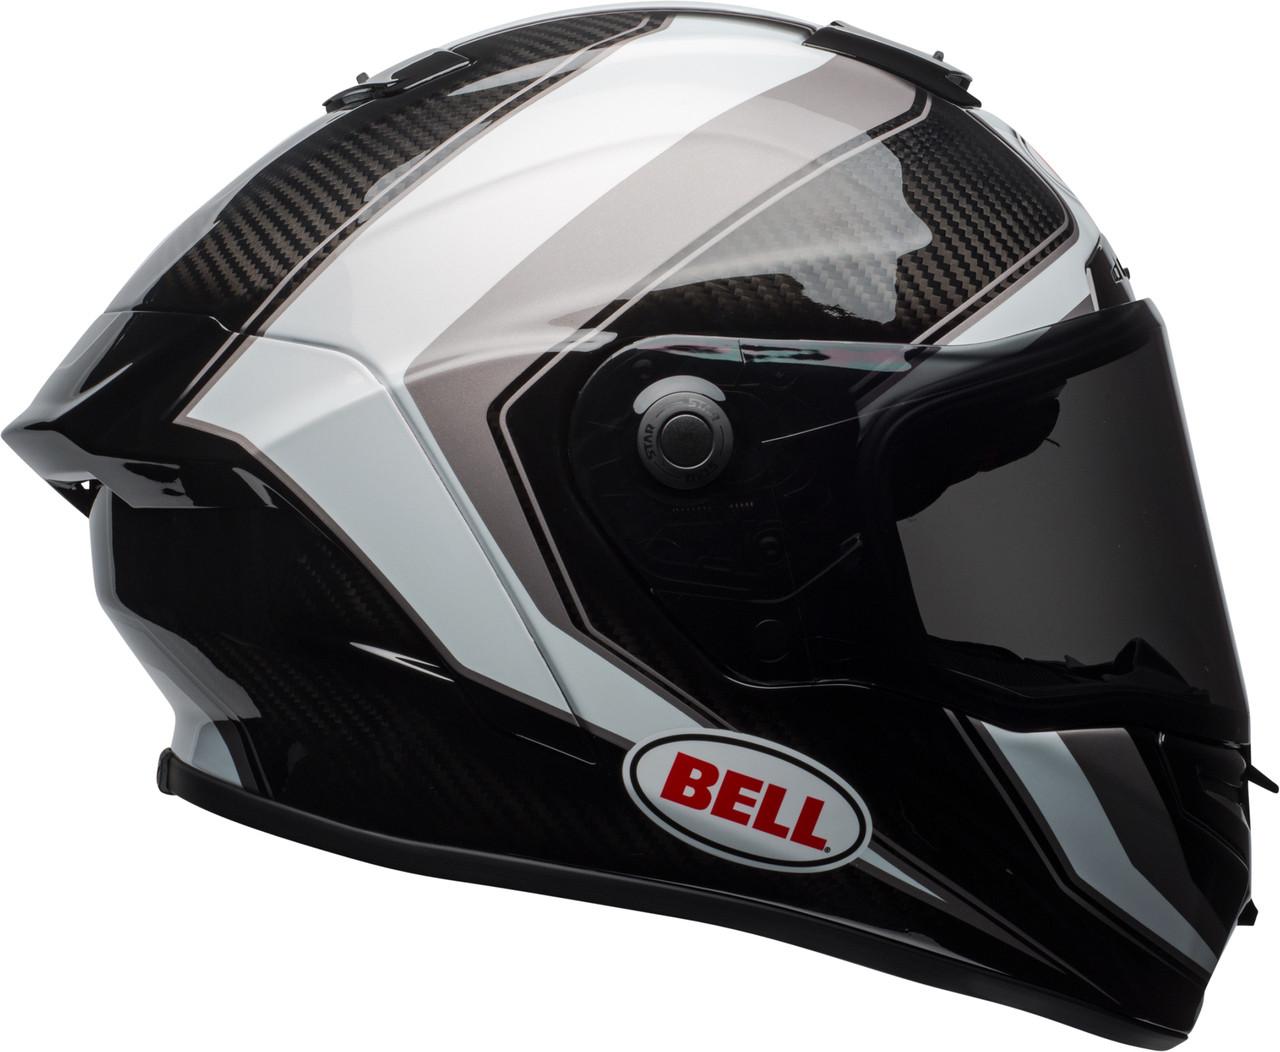 Bell Dual Sport Helmet >> Bell Race Star Sector Helmet | XtremeHelmets.com